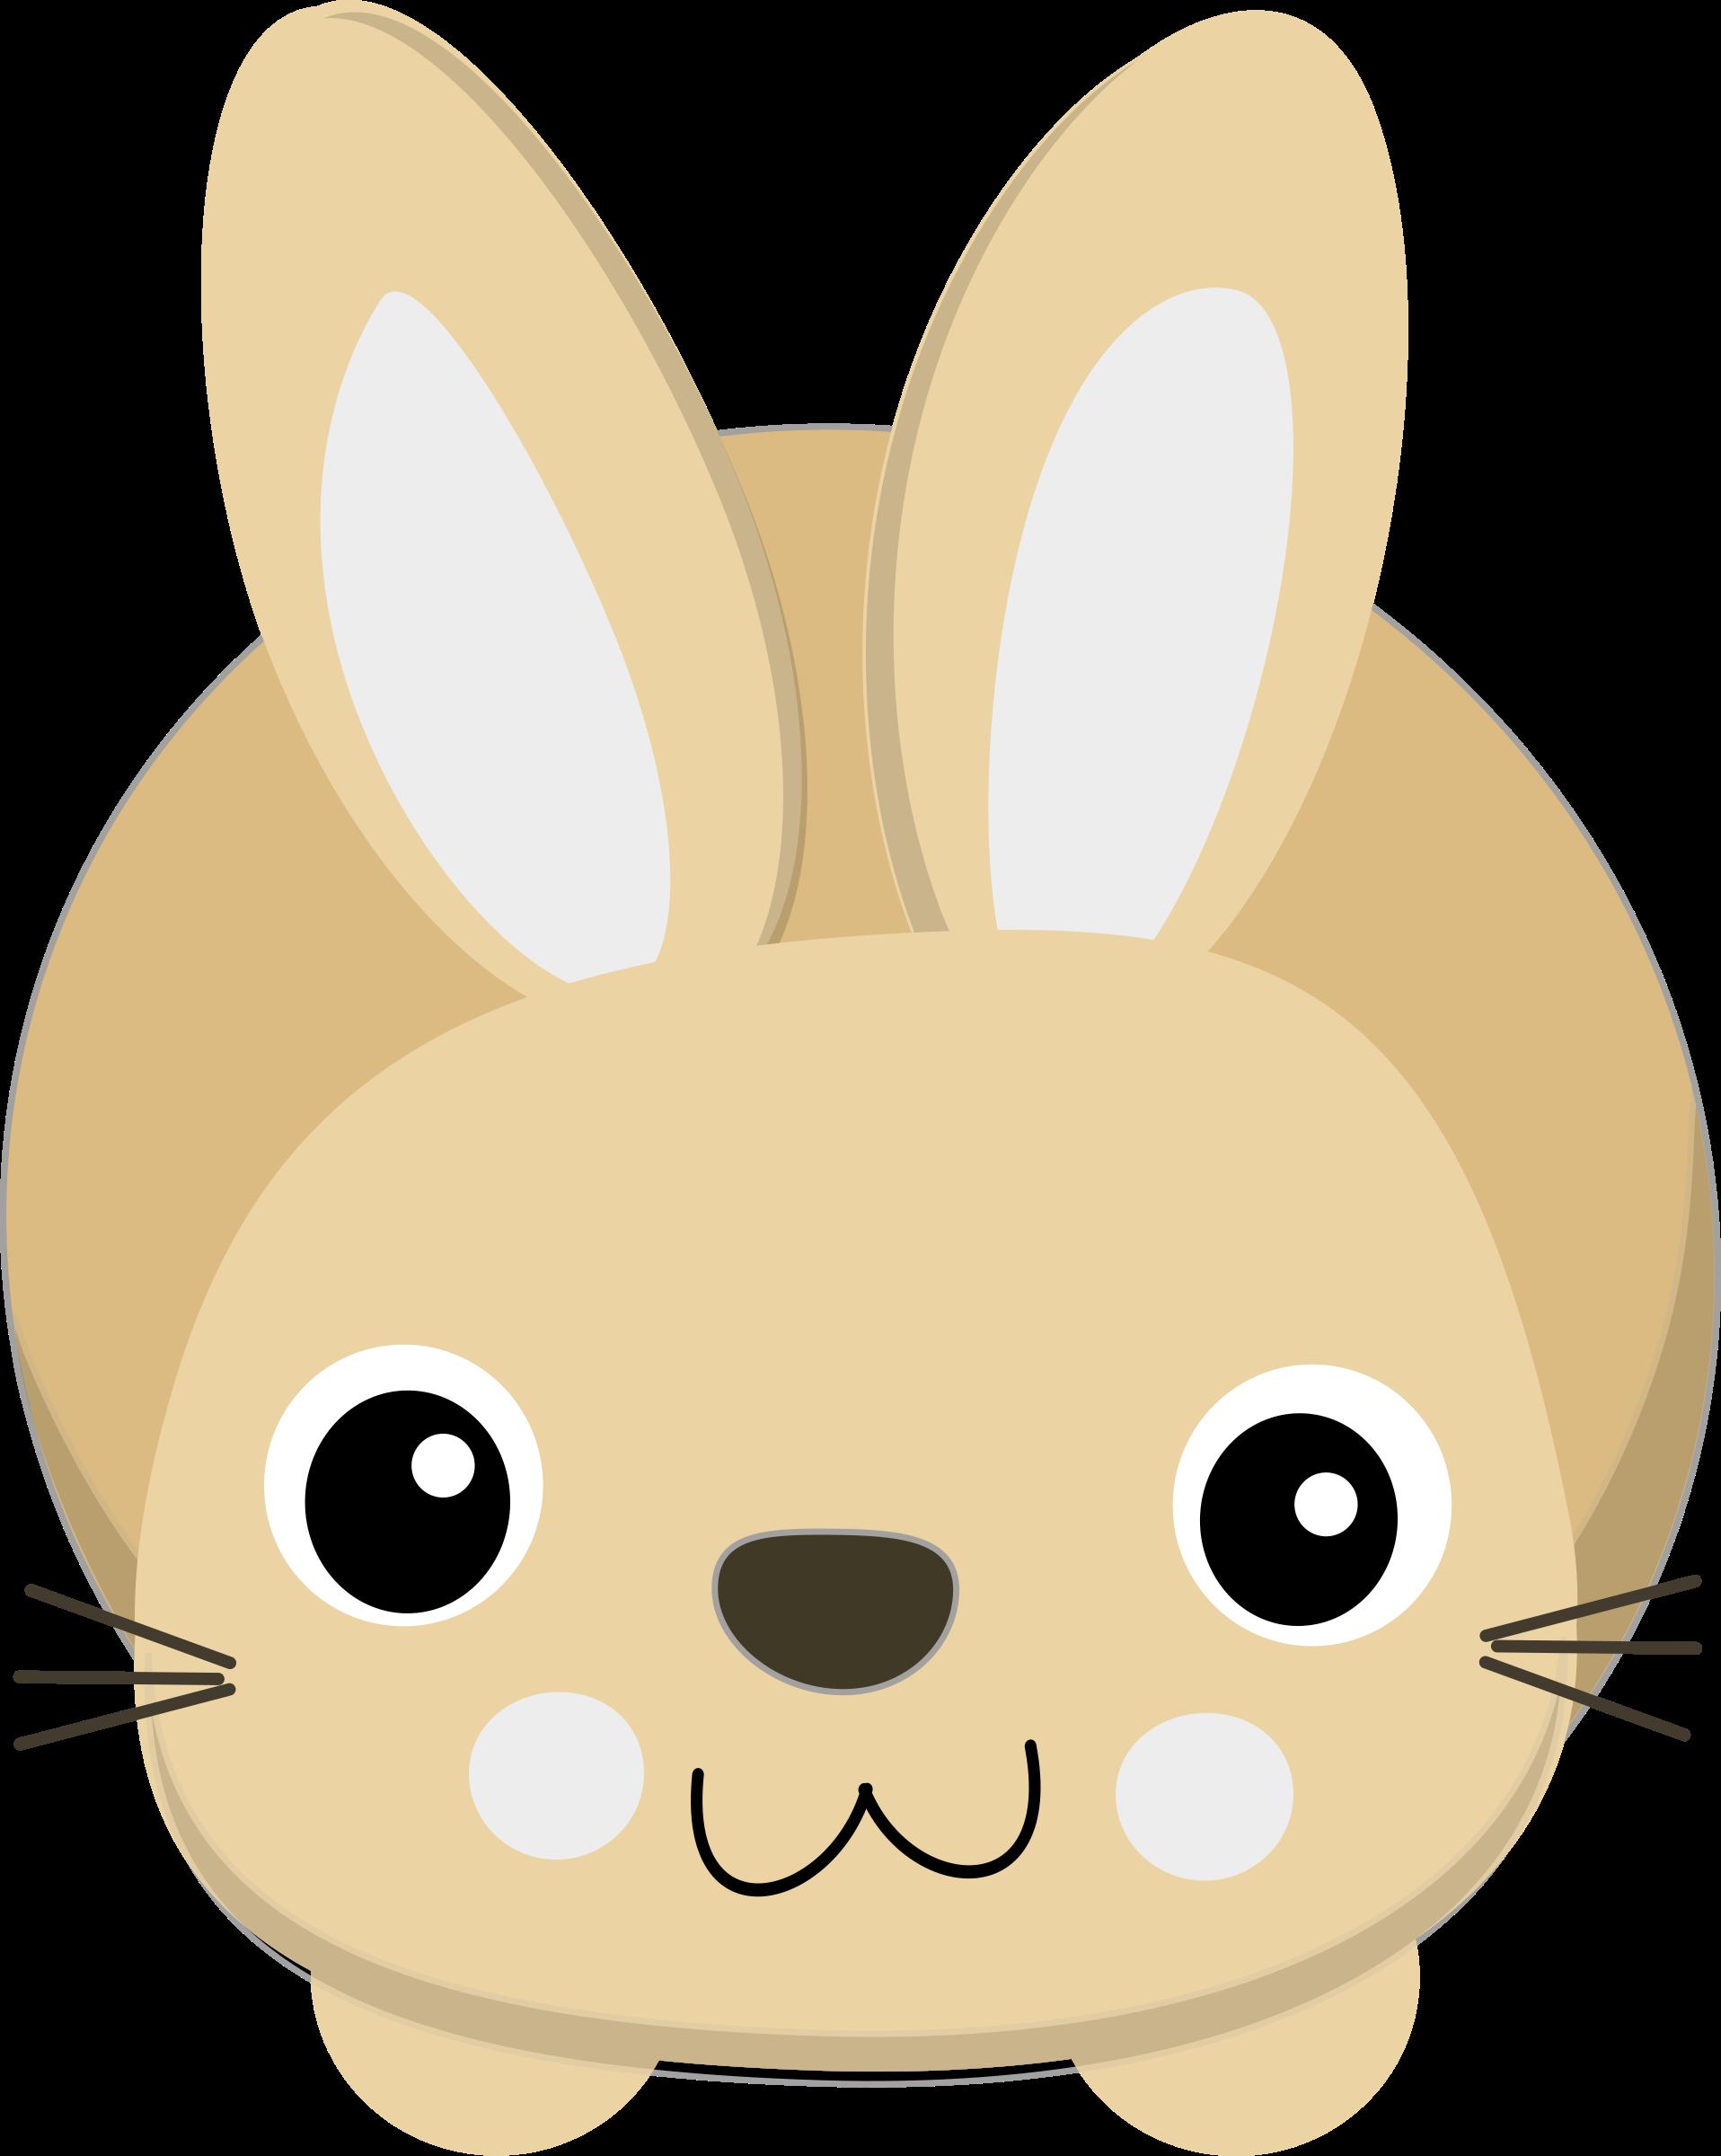 clipart cute bunny 1 rh openclipart org cute baby bunny clipart cute baby bunny clipart